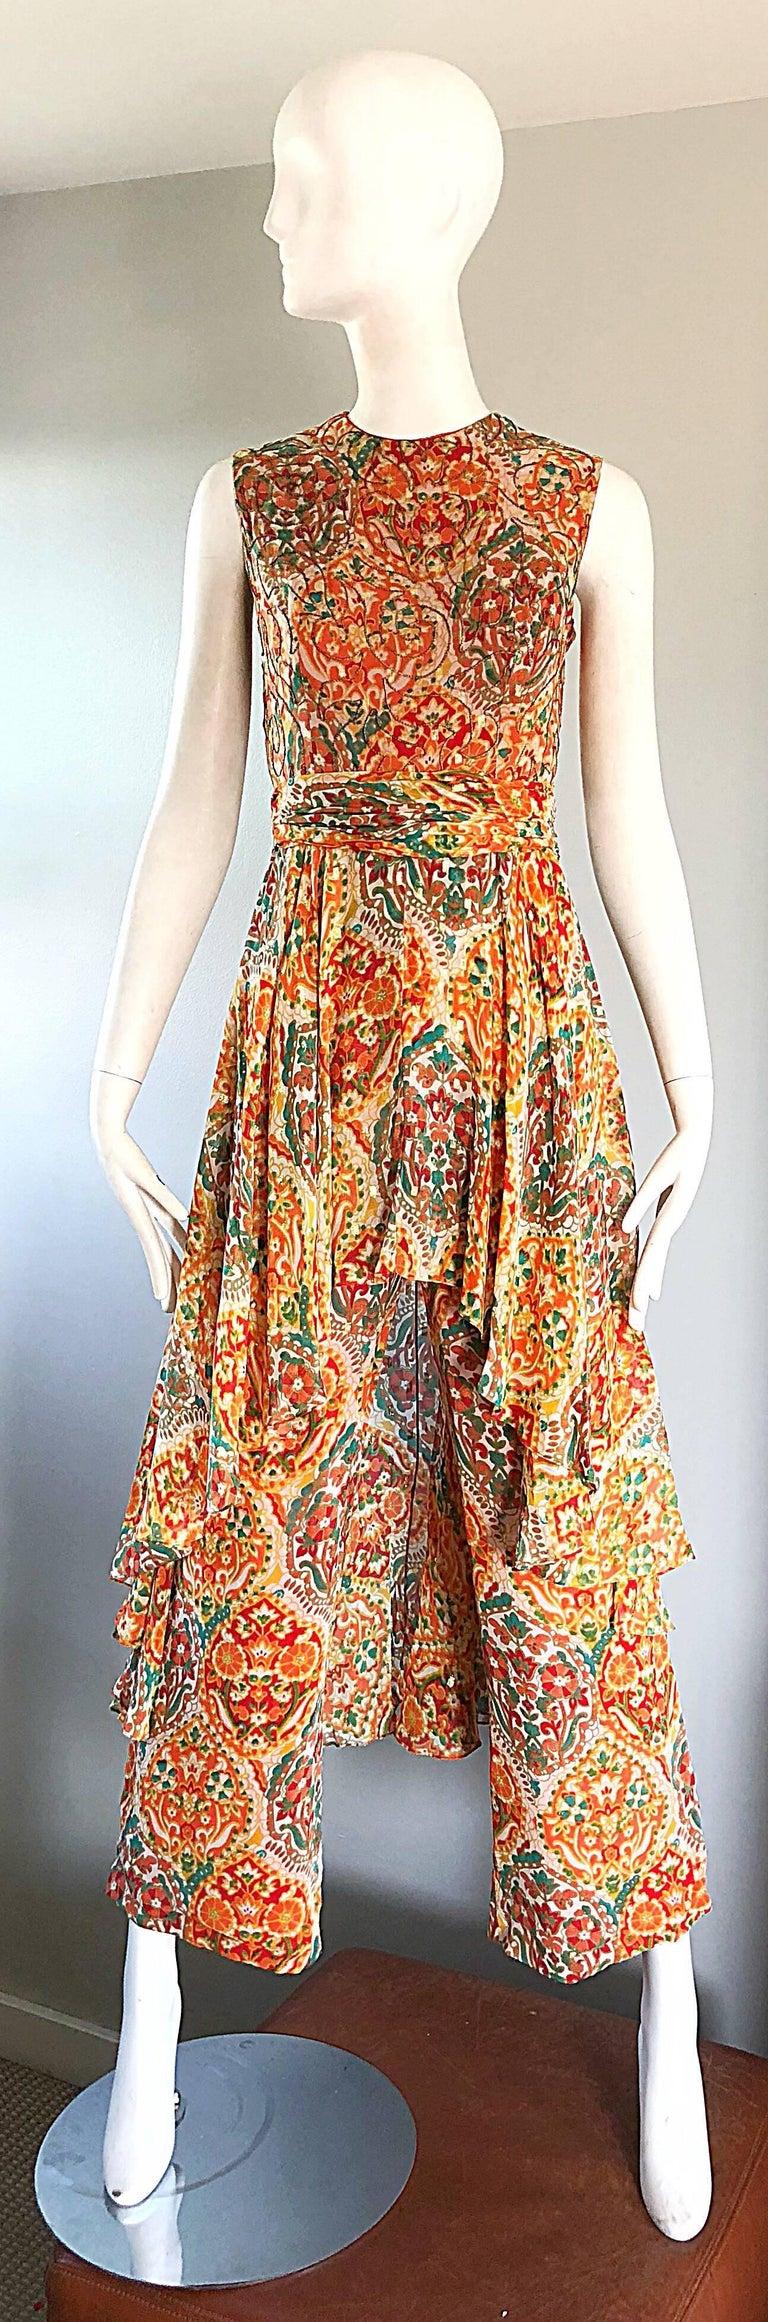 Brown Oscar de la Renta Silk Boho Batik Print Vintage Jumpsuit with Attached Skirt  For Sale